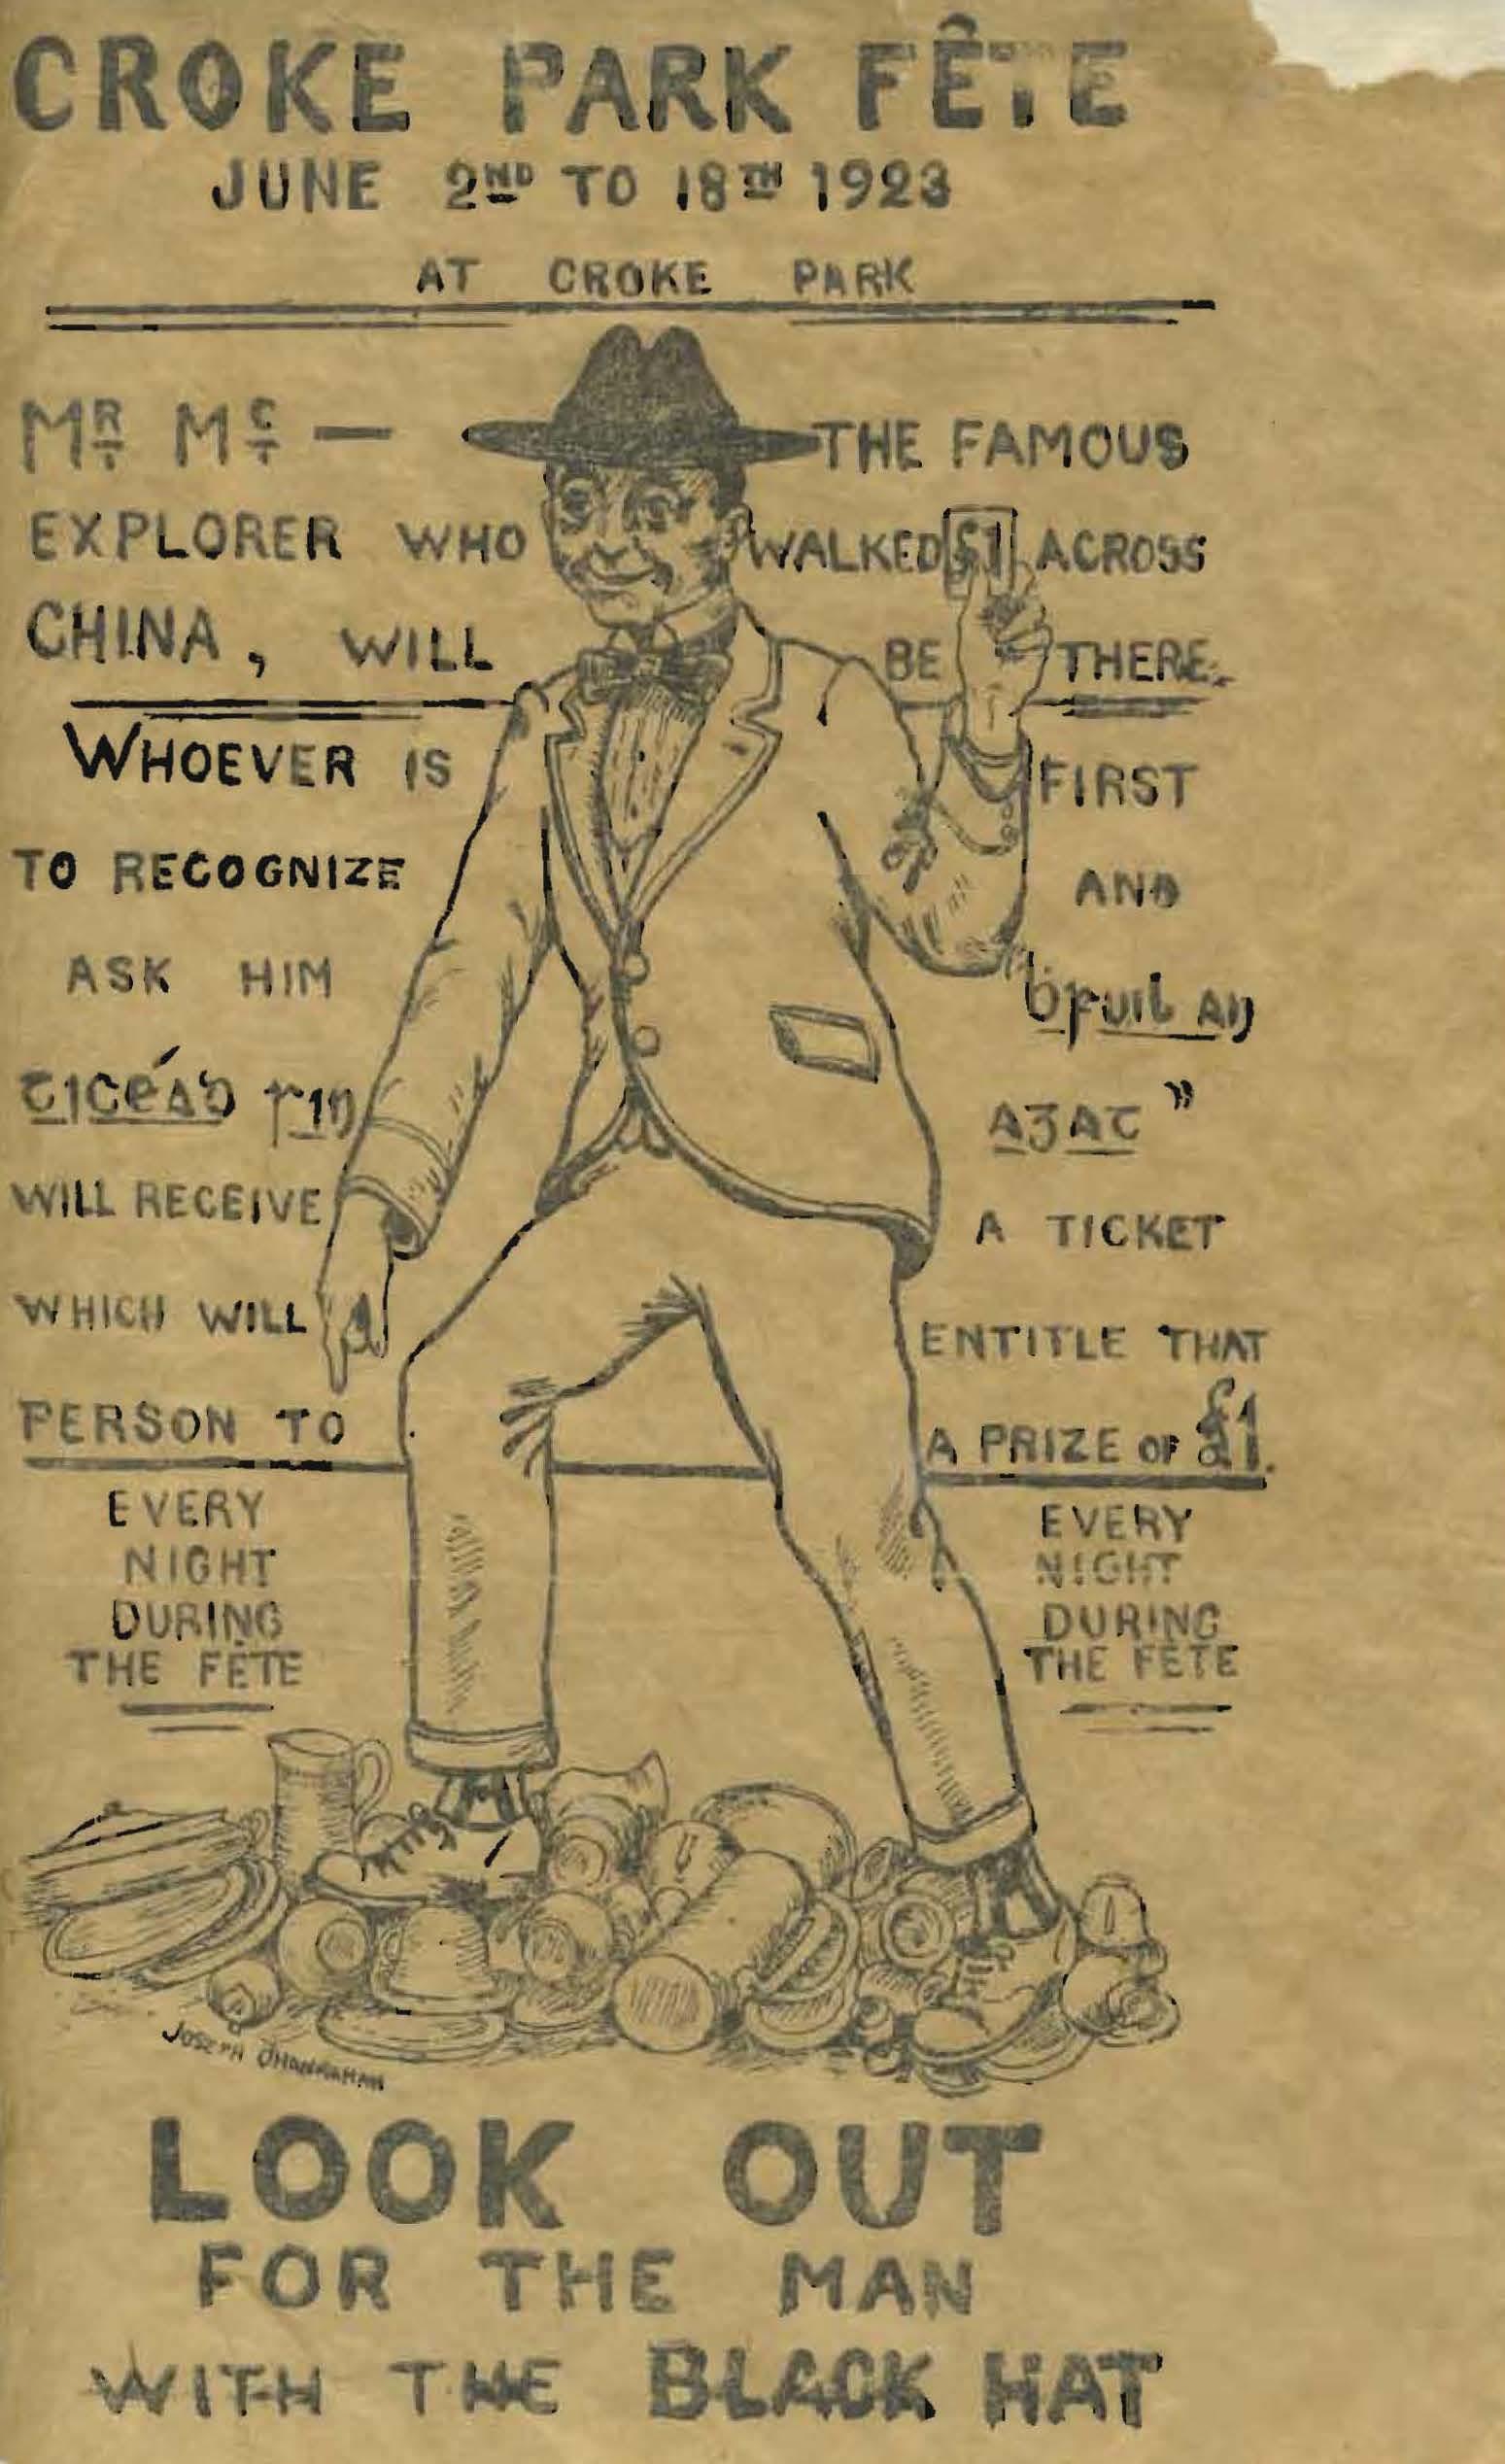 1923 Croke Park Fête Poster